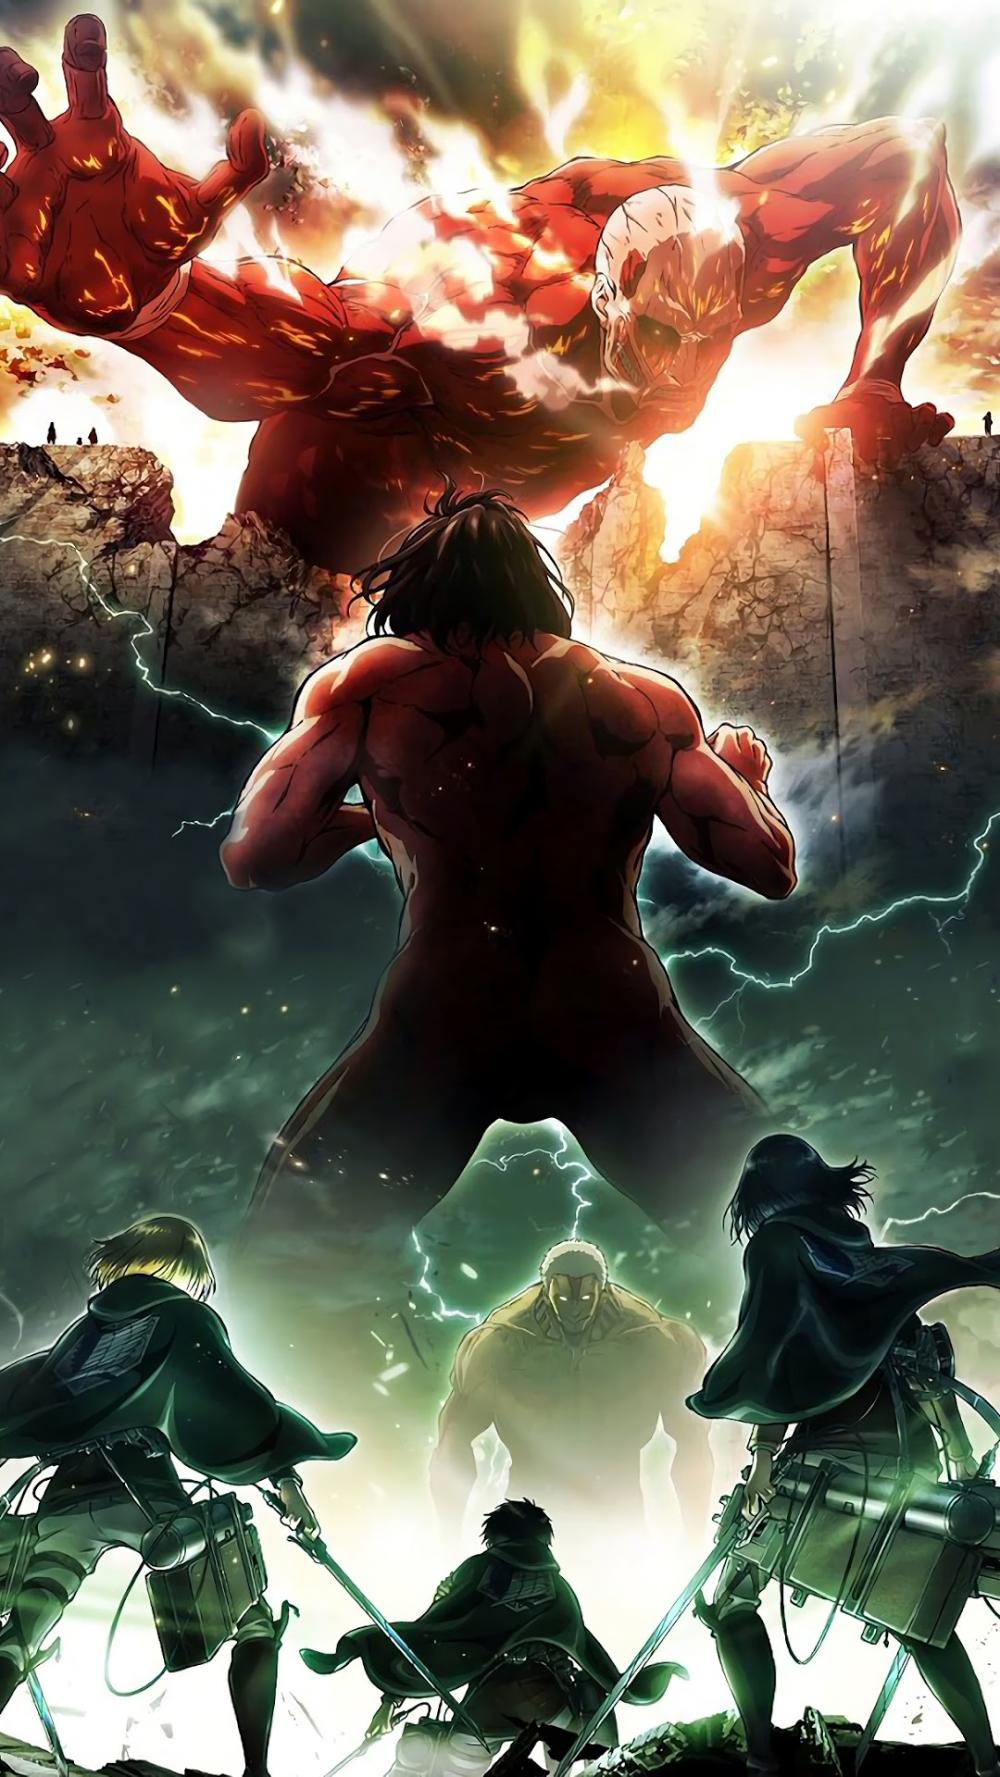 Attack On Titan Wallpaper 4k Phone Picture Idokeren